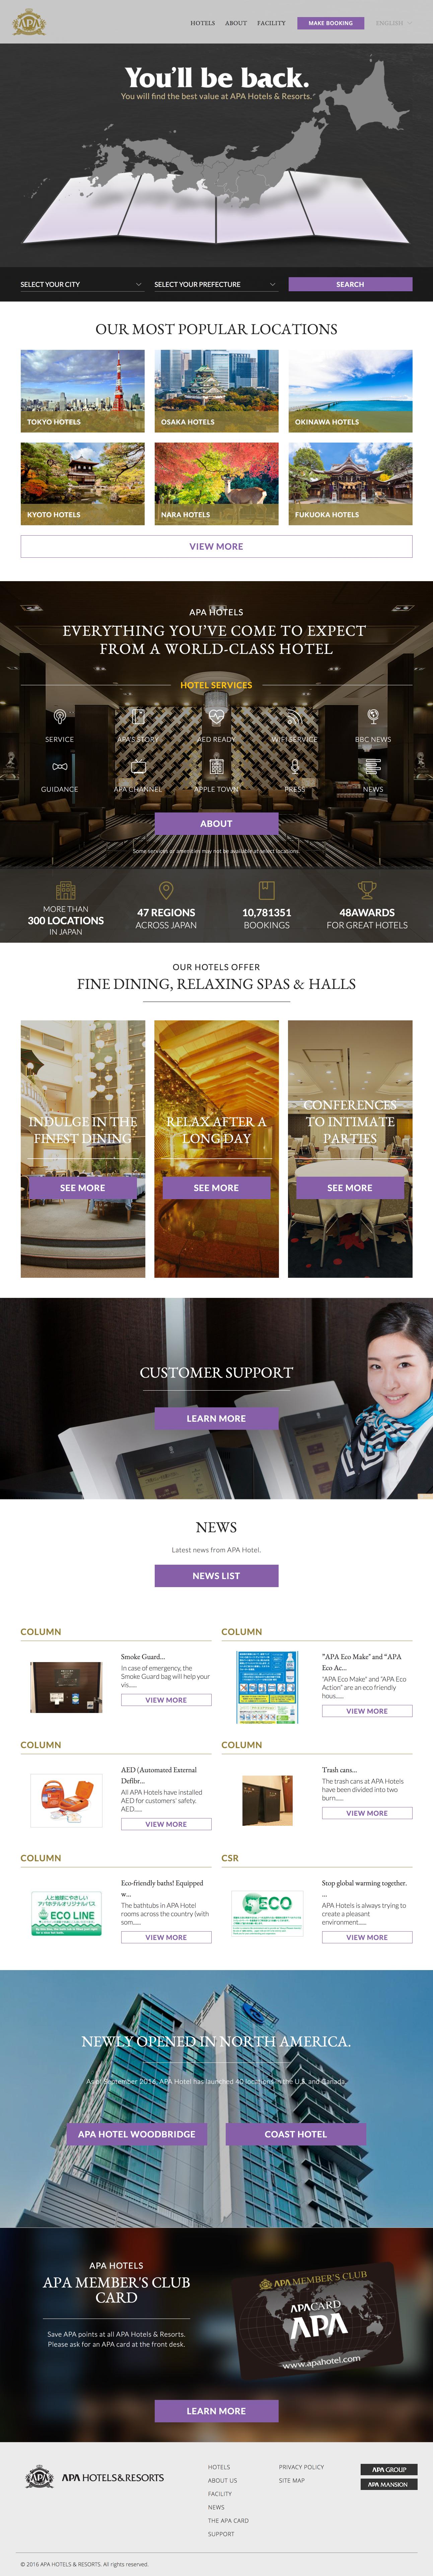 Design samples for APA hotel's international presence.